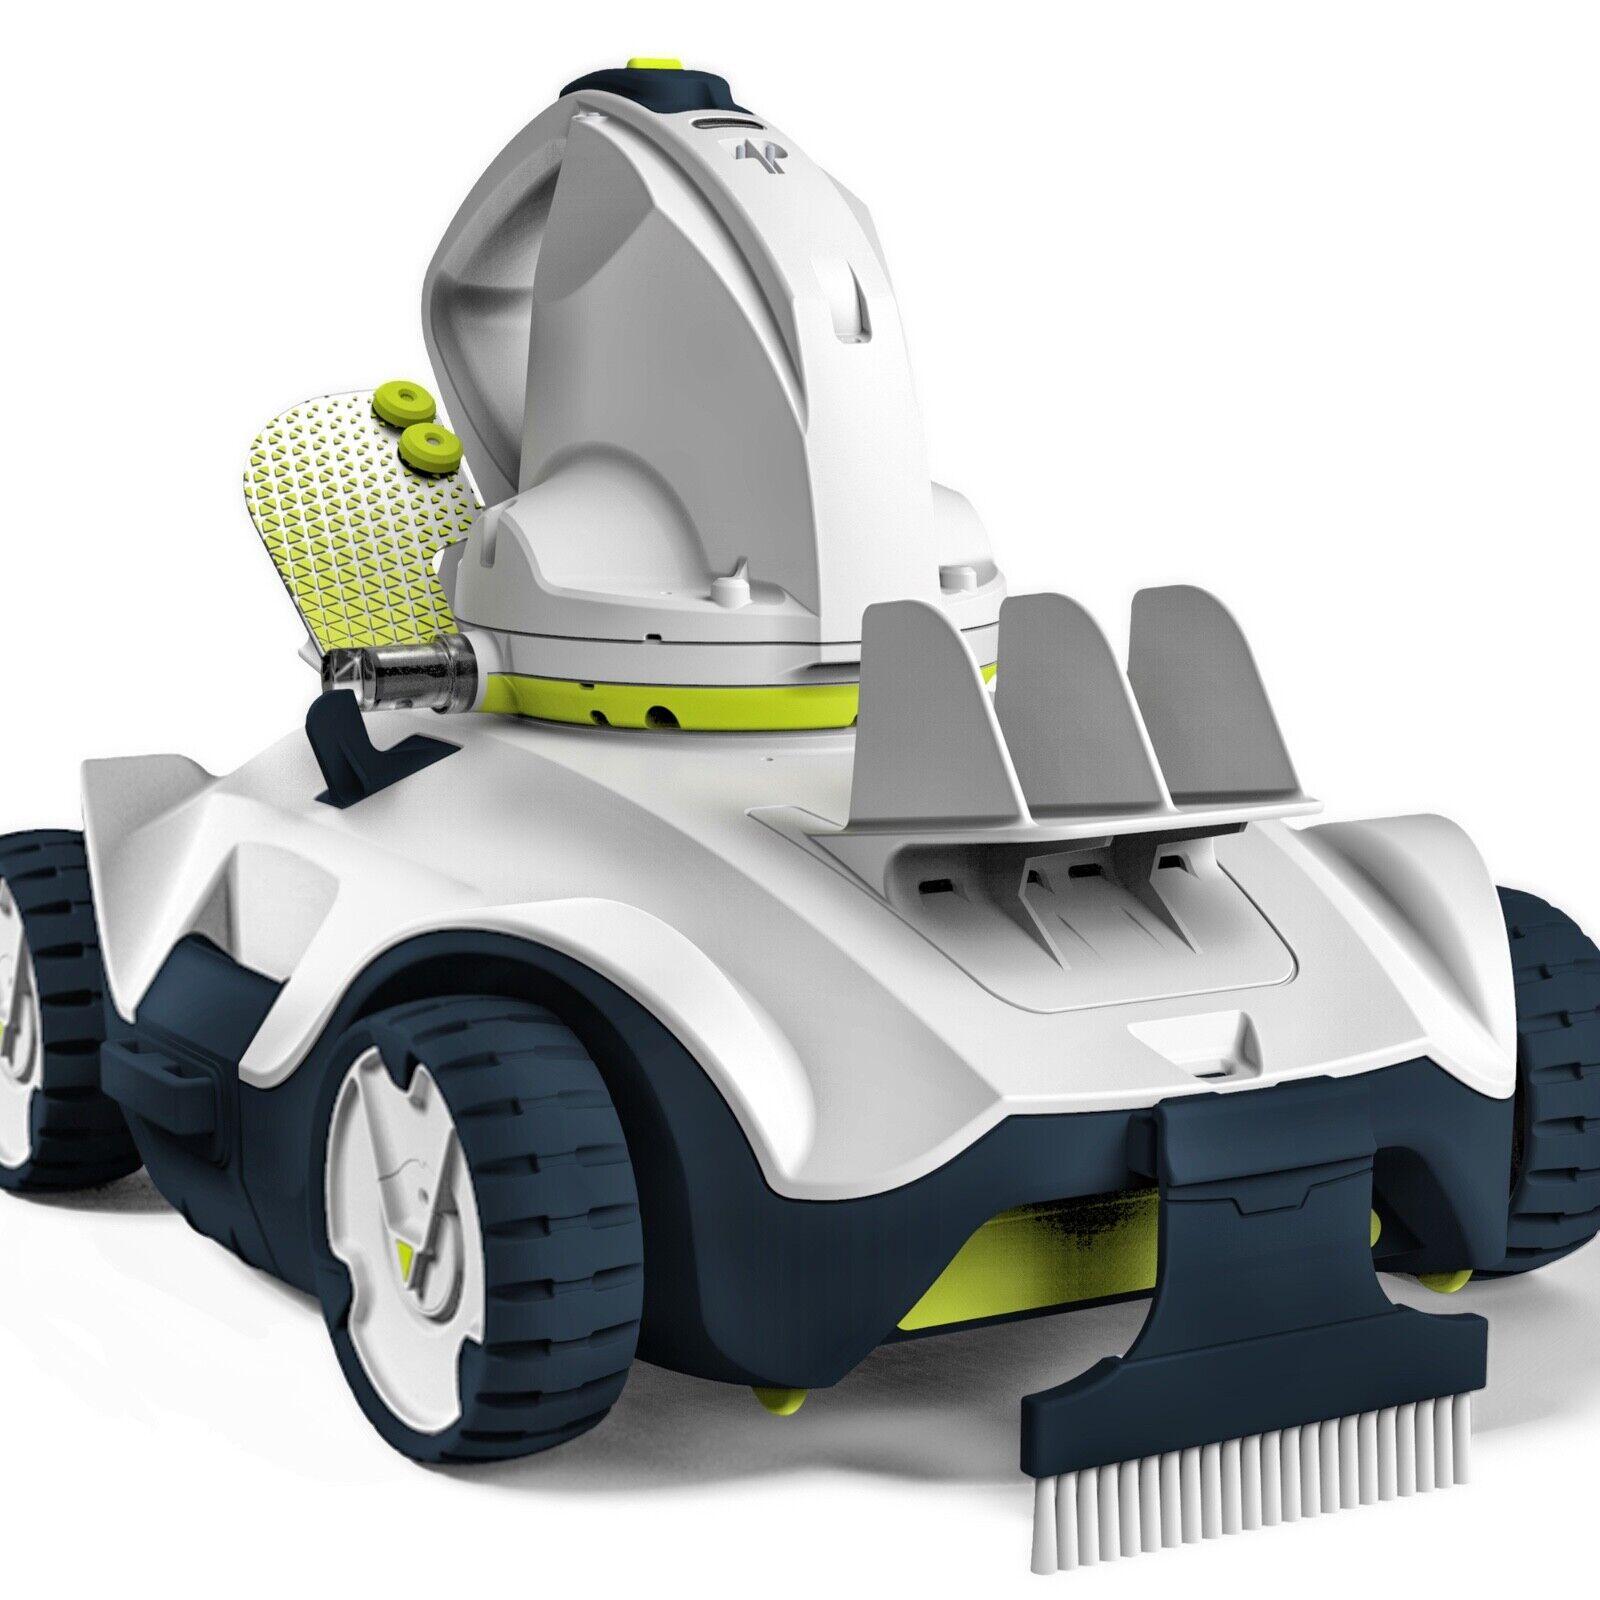 Poolroboter Zodiac Vortex OV 3300 Poolsauger Schwimmbecken-Sauger Bodensauger